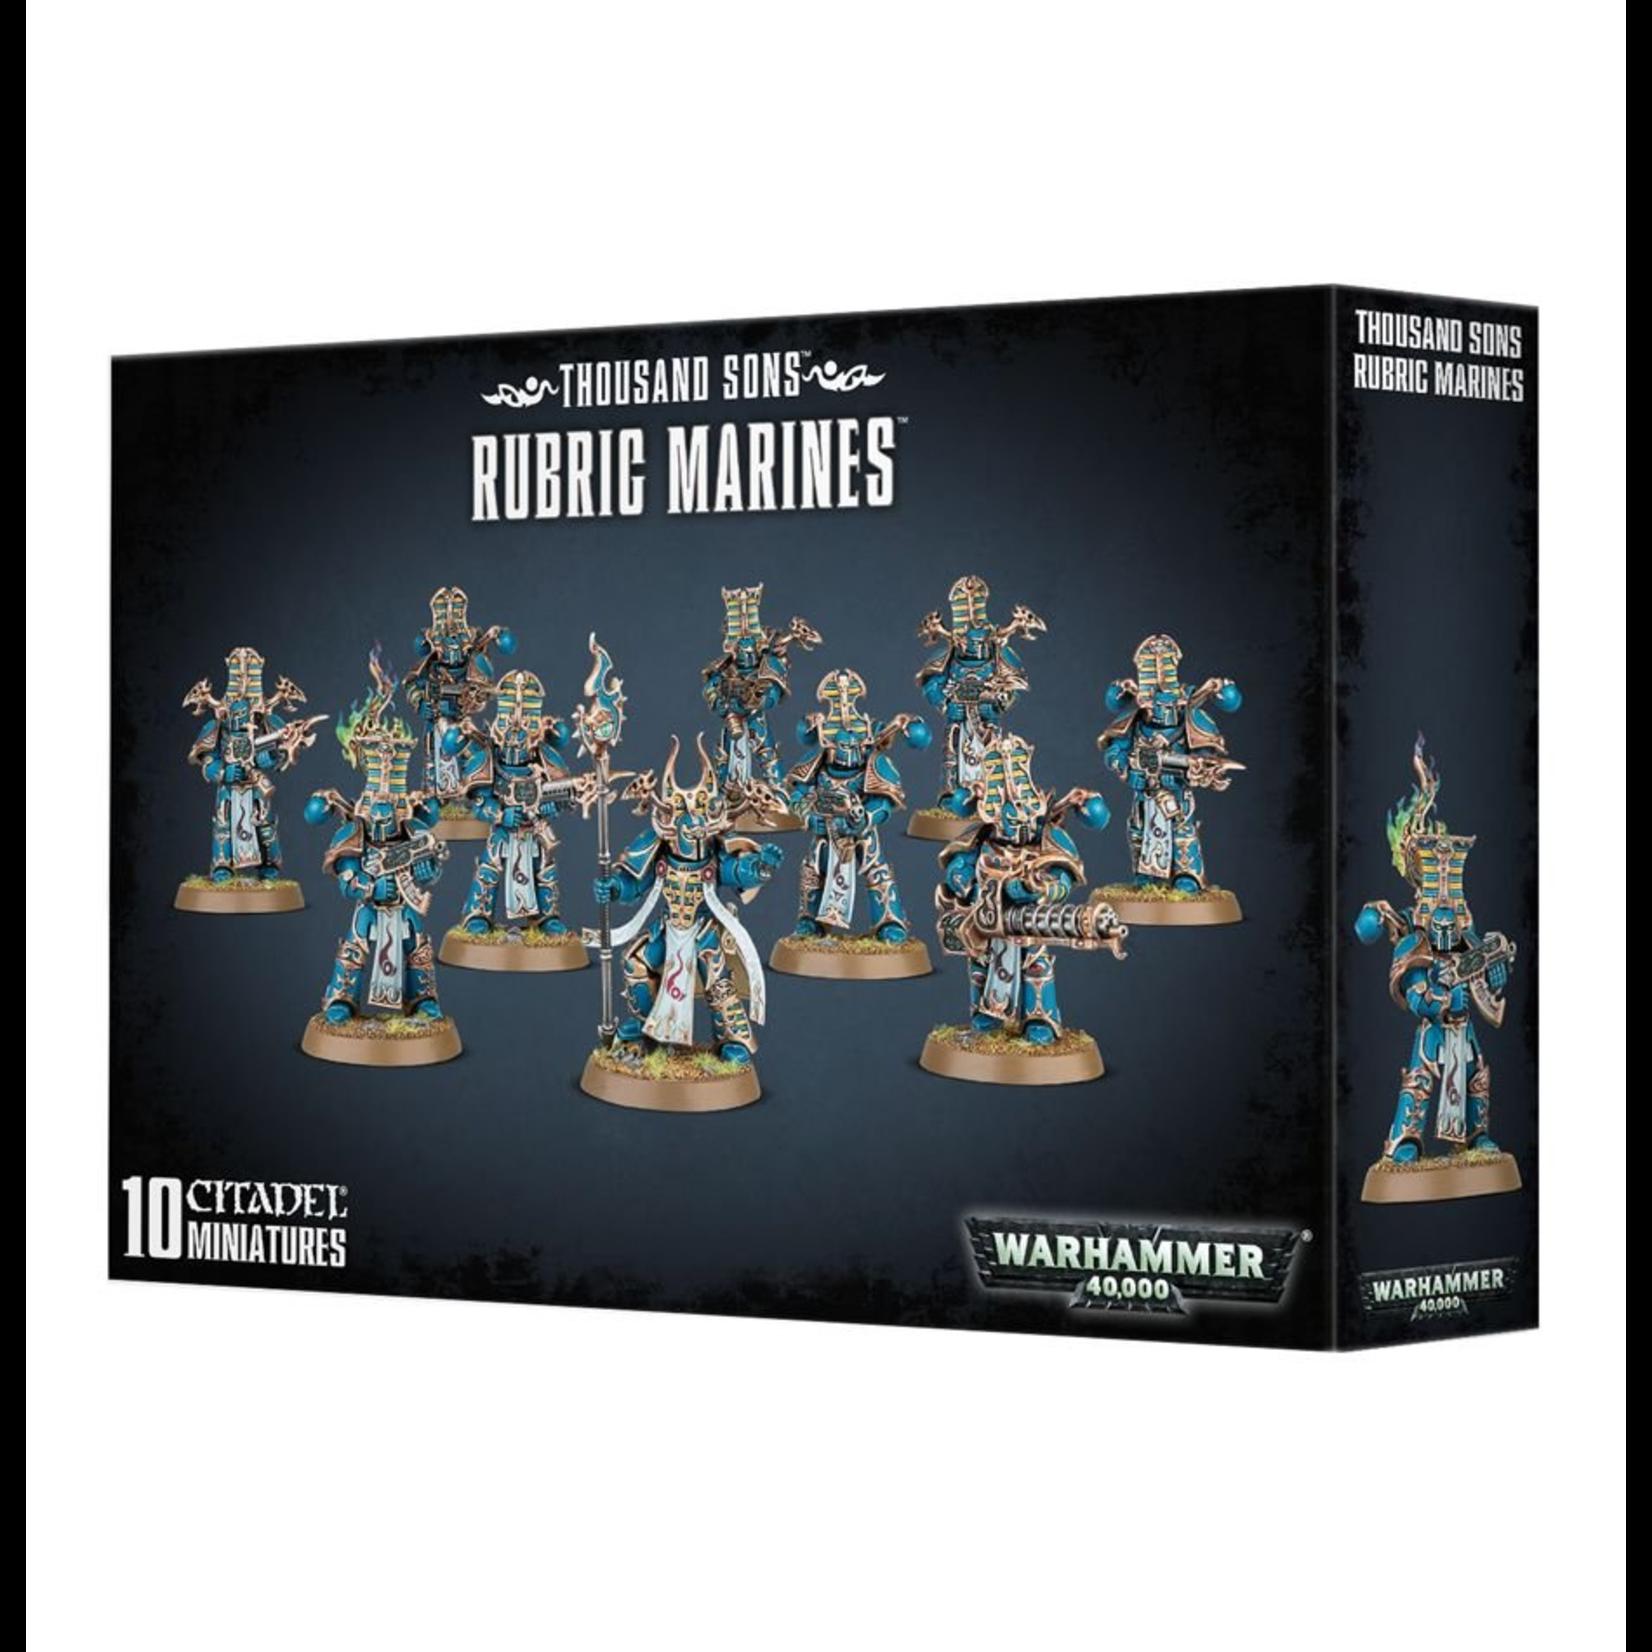 Games Workshop Warhammer 40k: Thousand Sons Rubric Marines